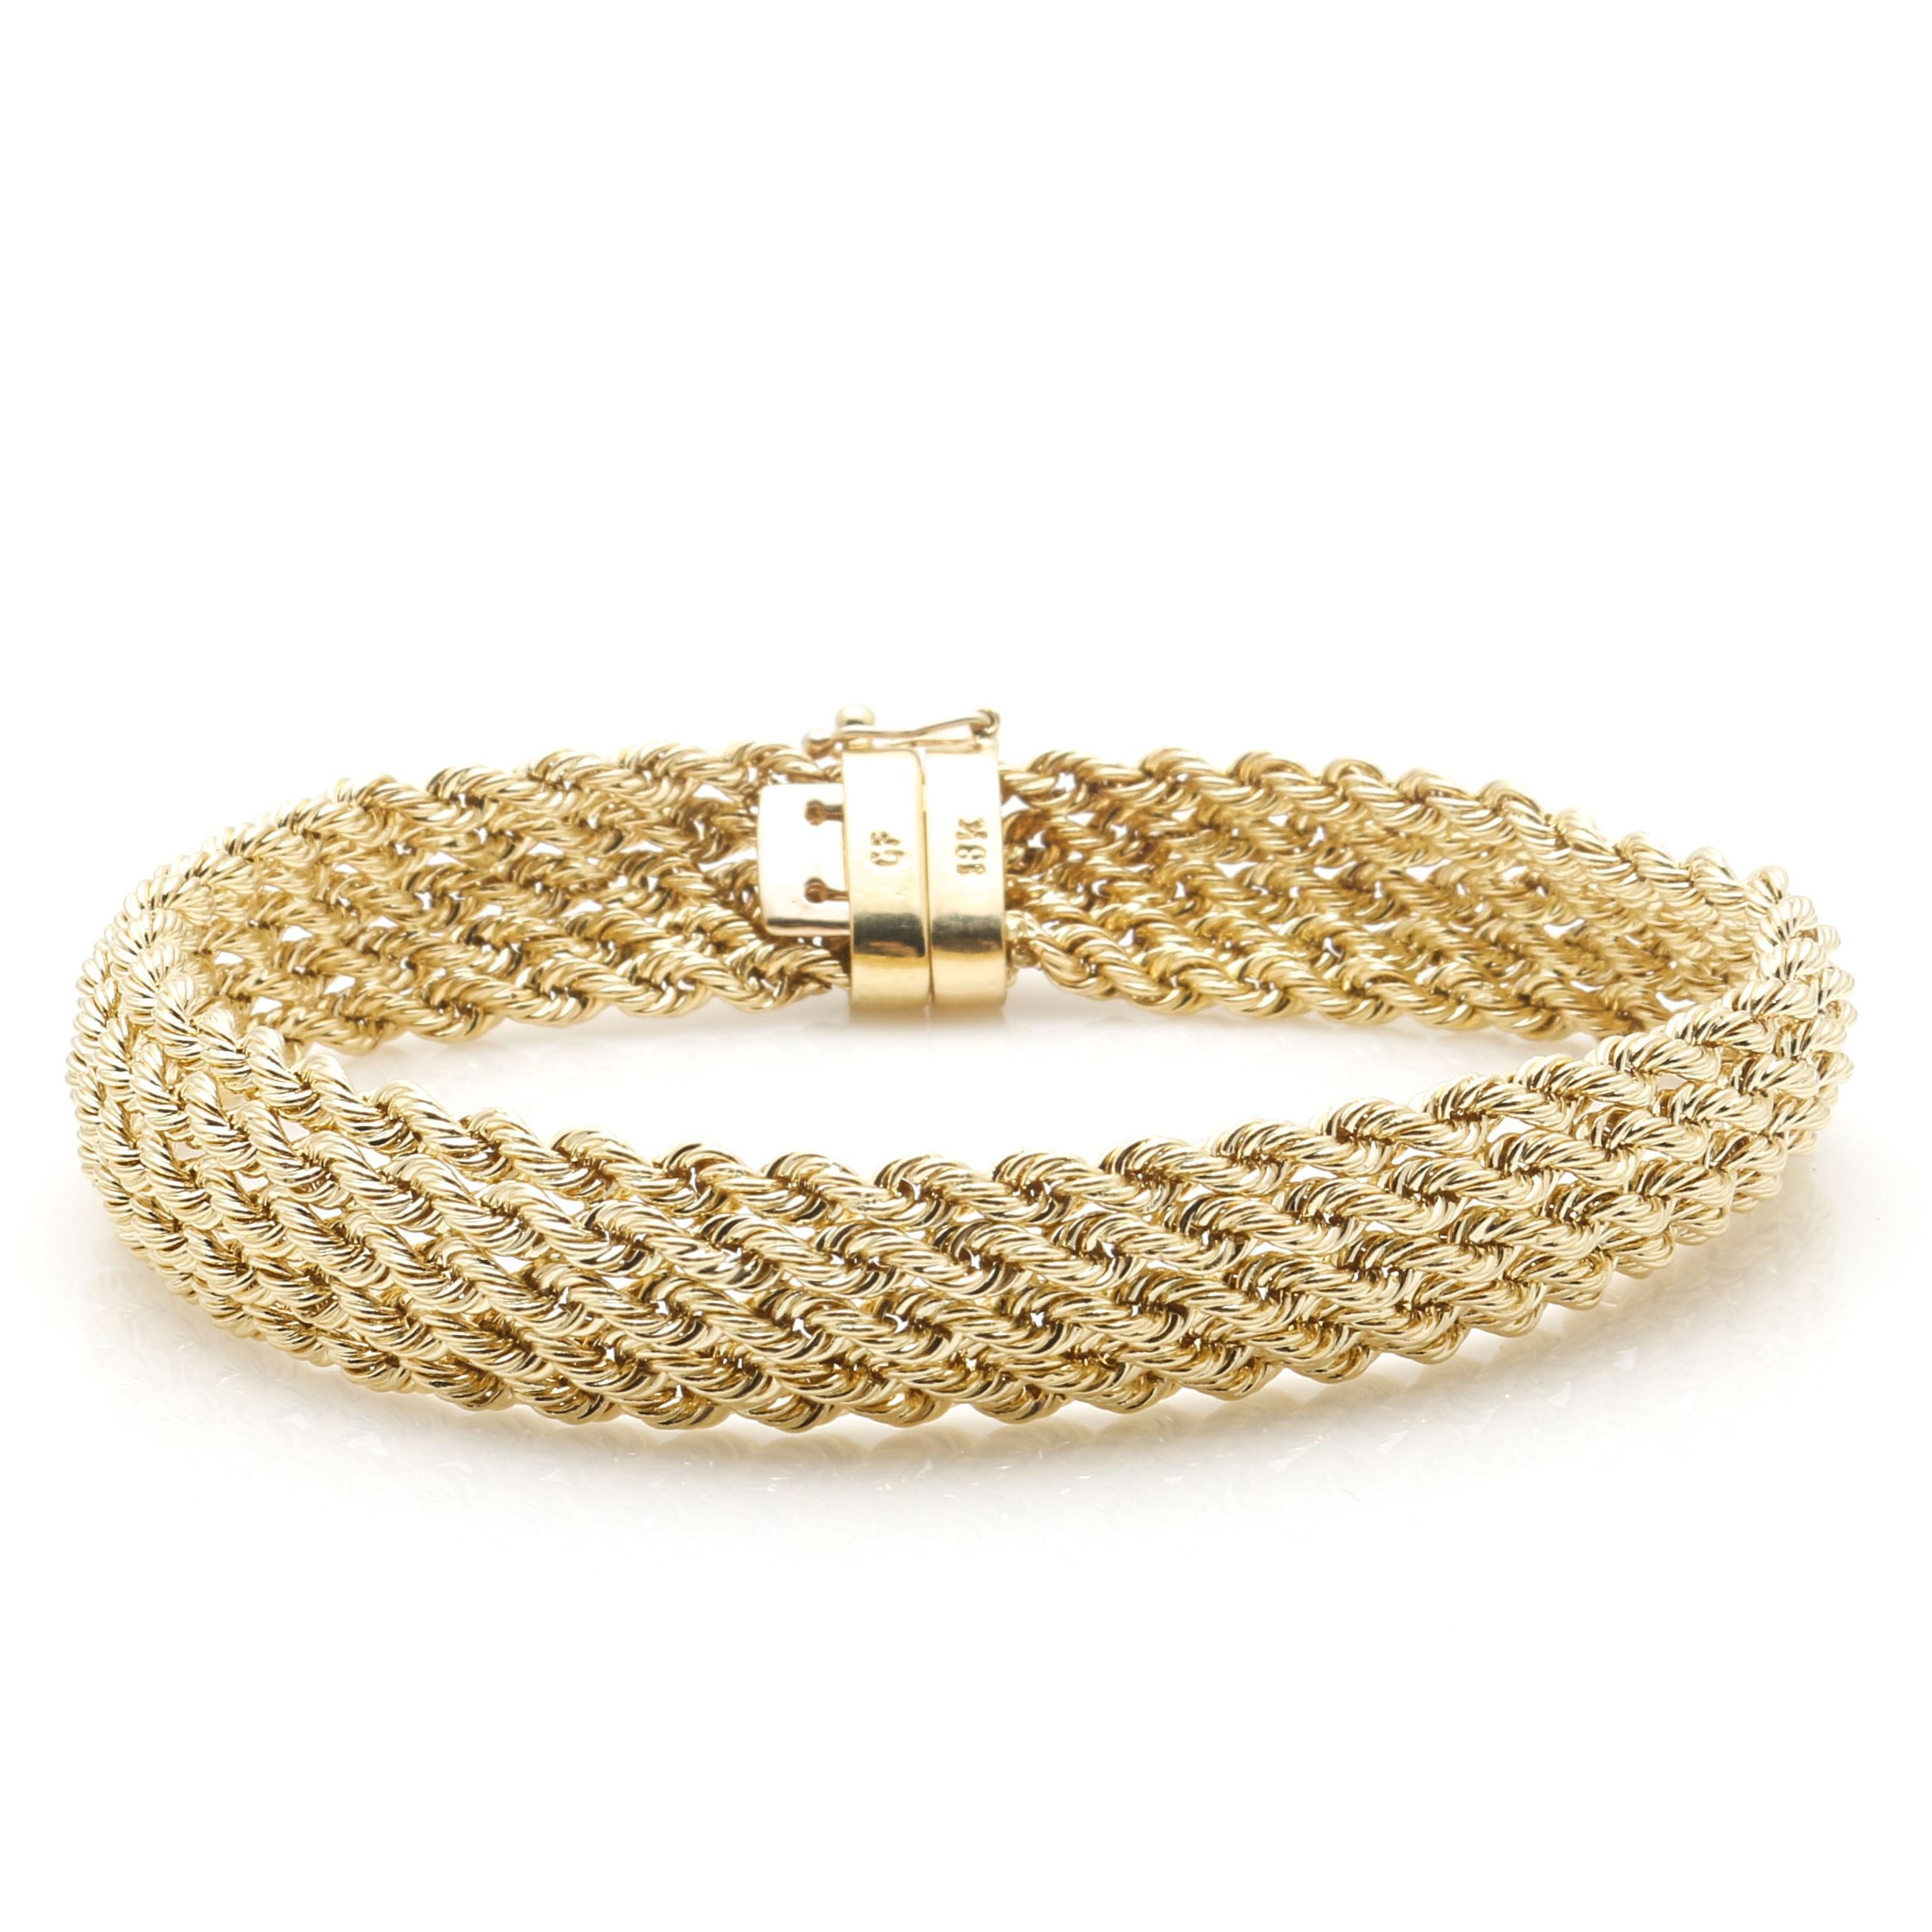 18K Yellow Gold Rope Chain Bracelet